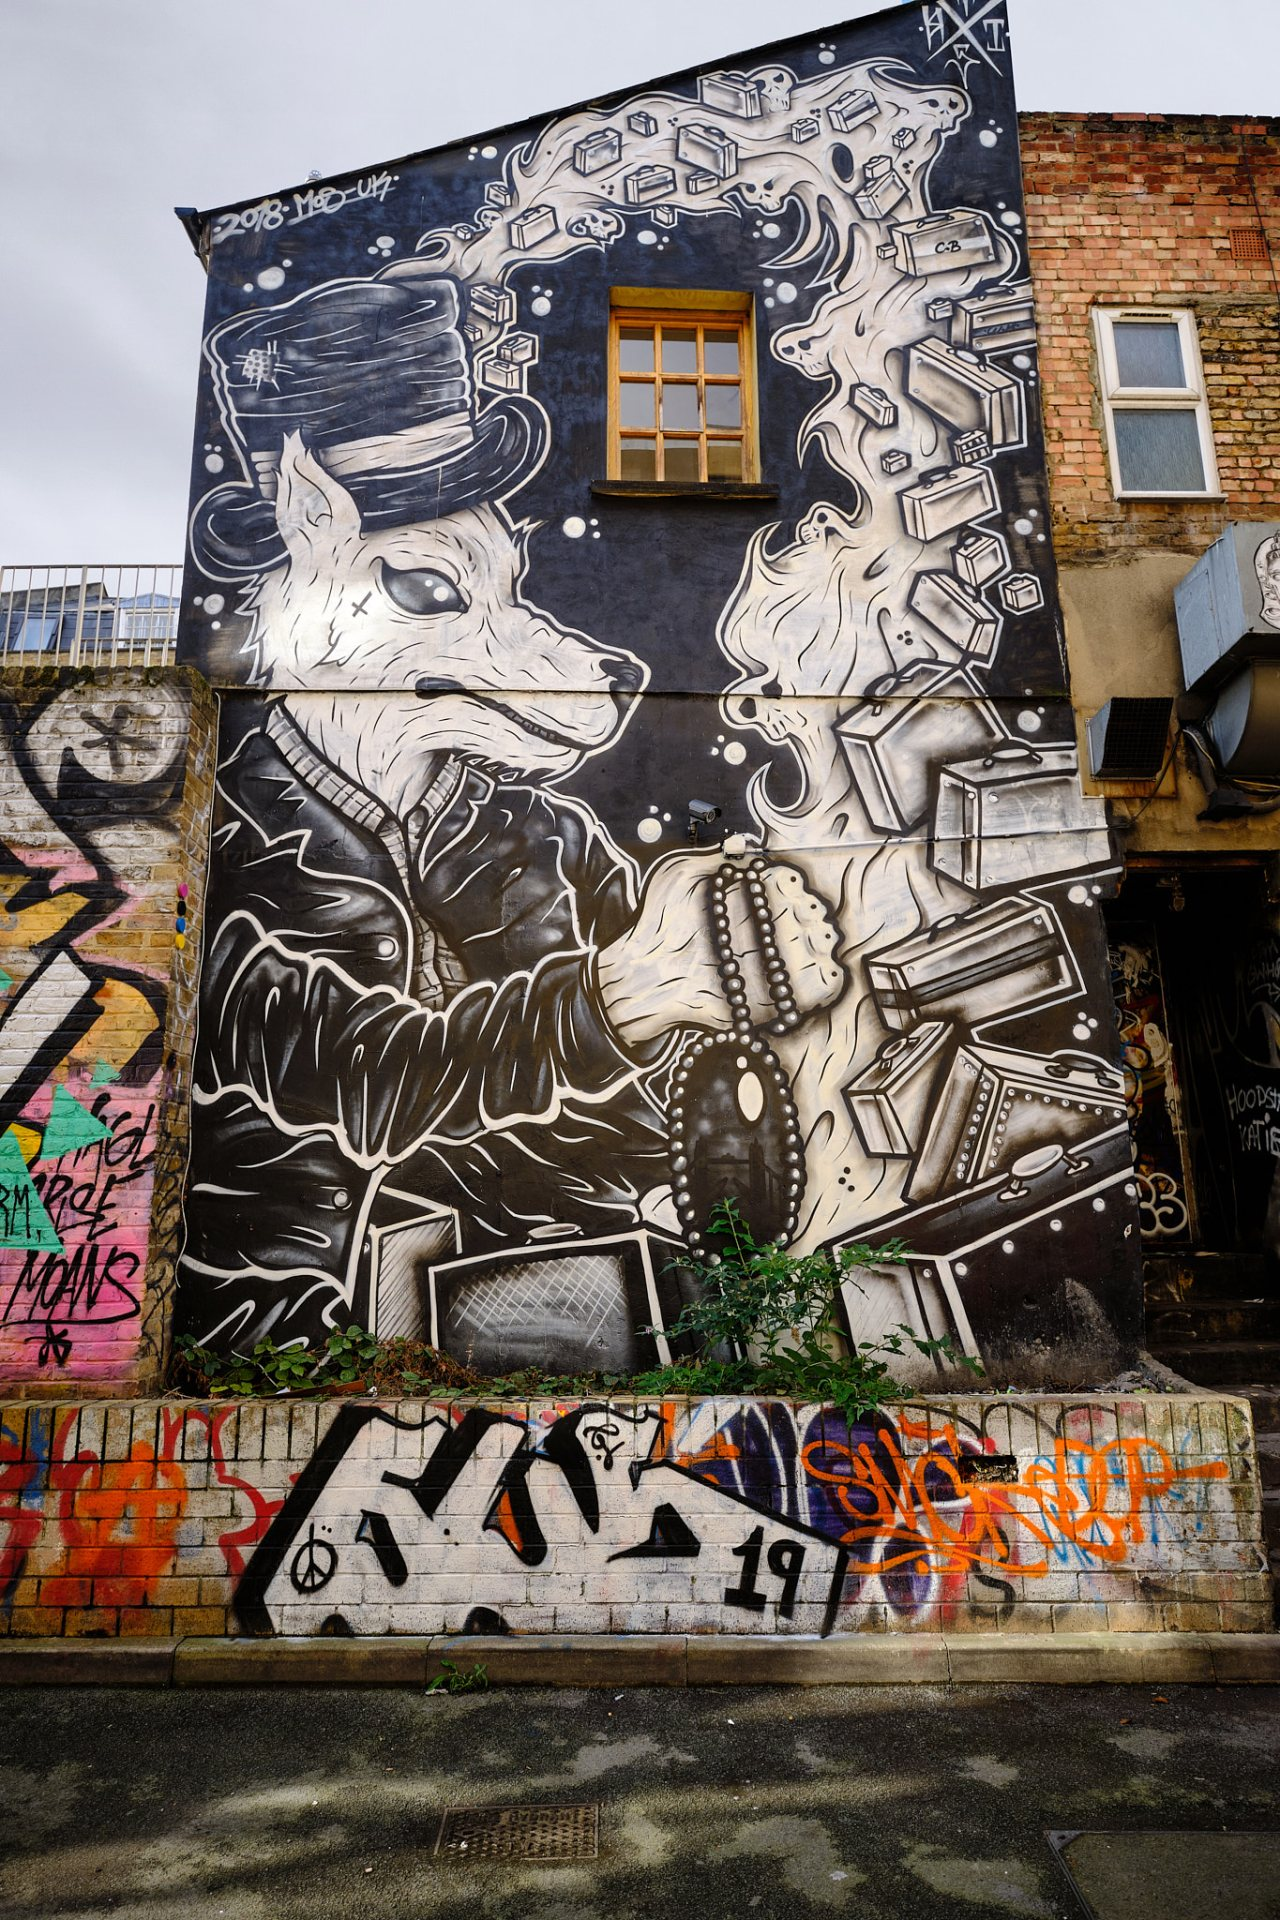 Big Bad Wolf - Shoreditch, London